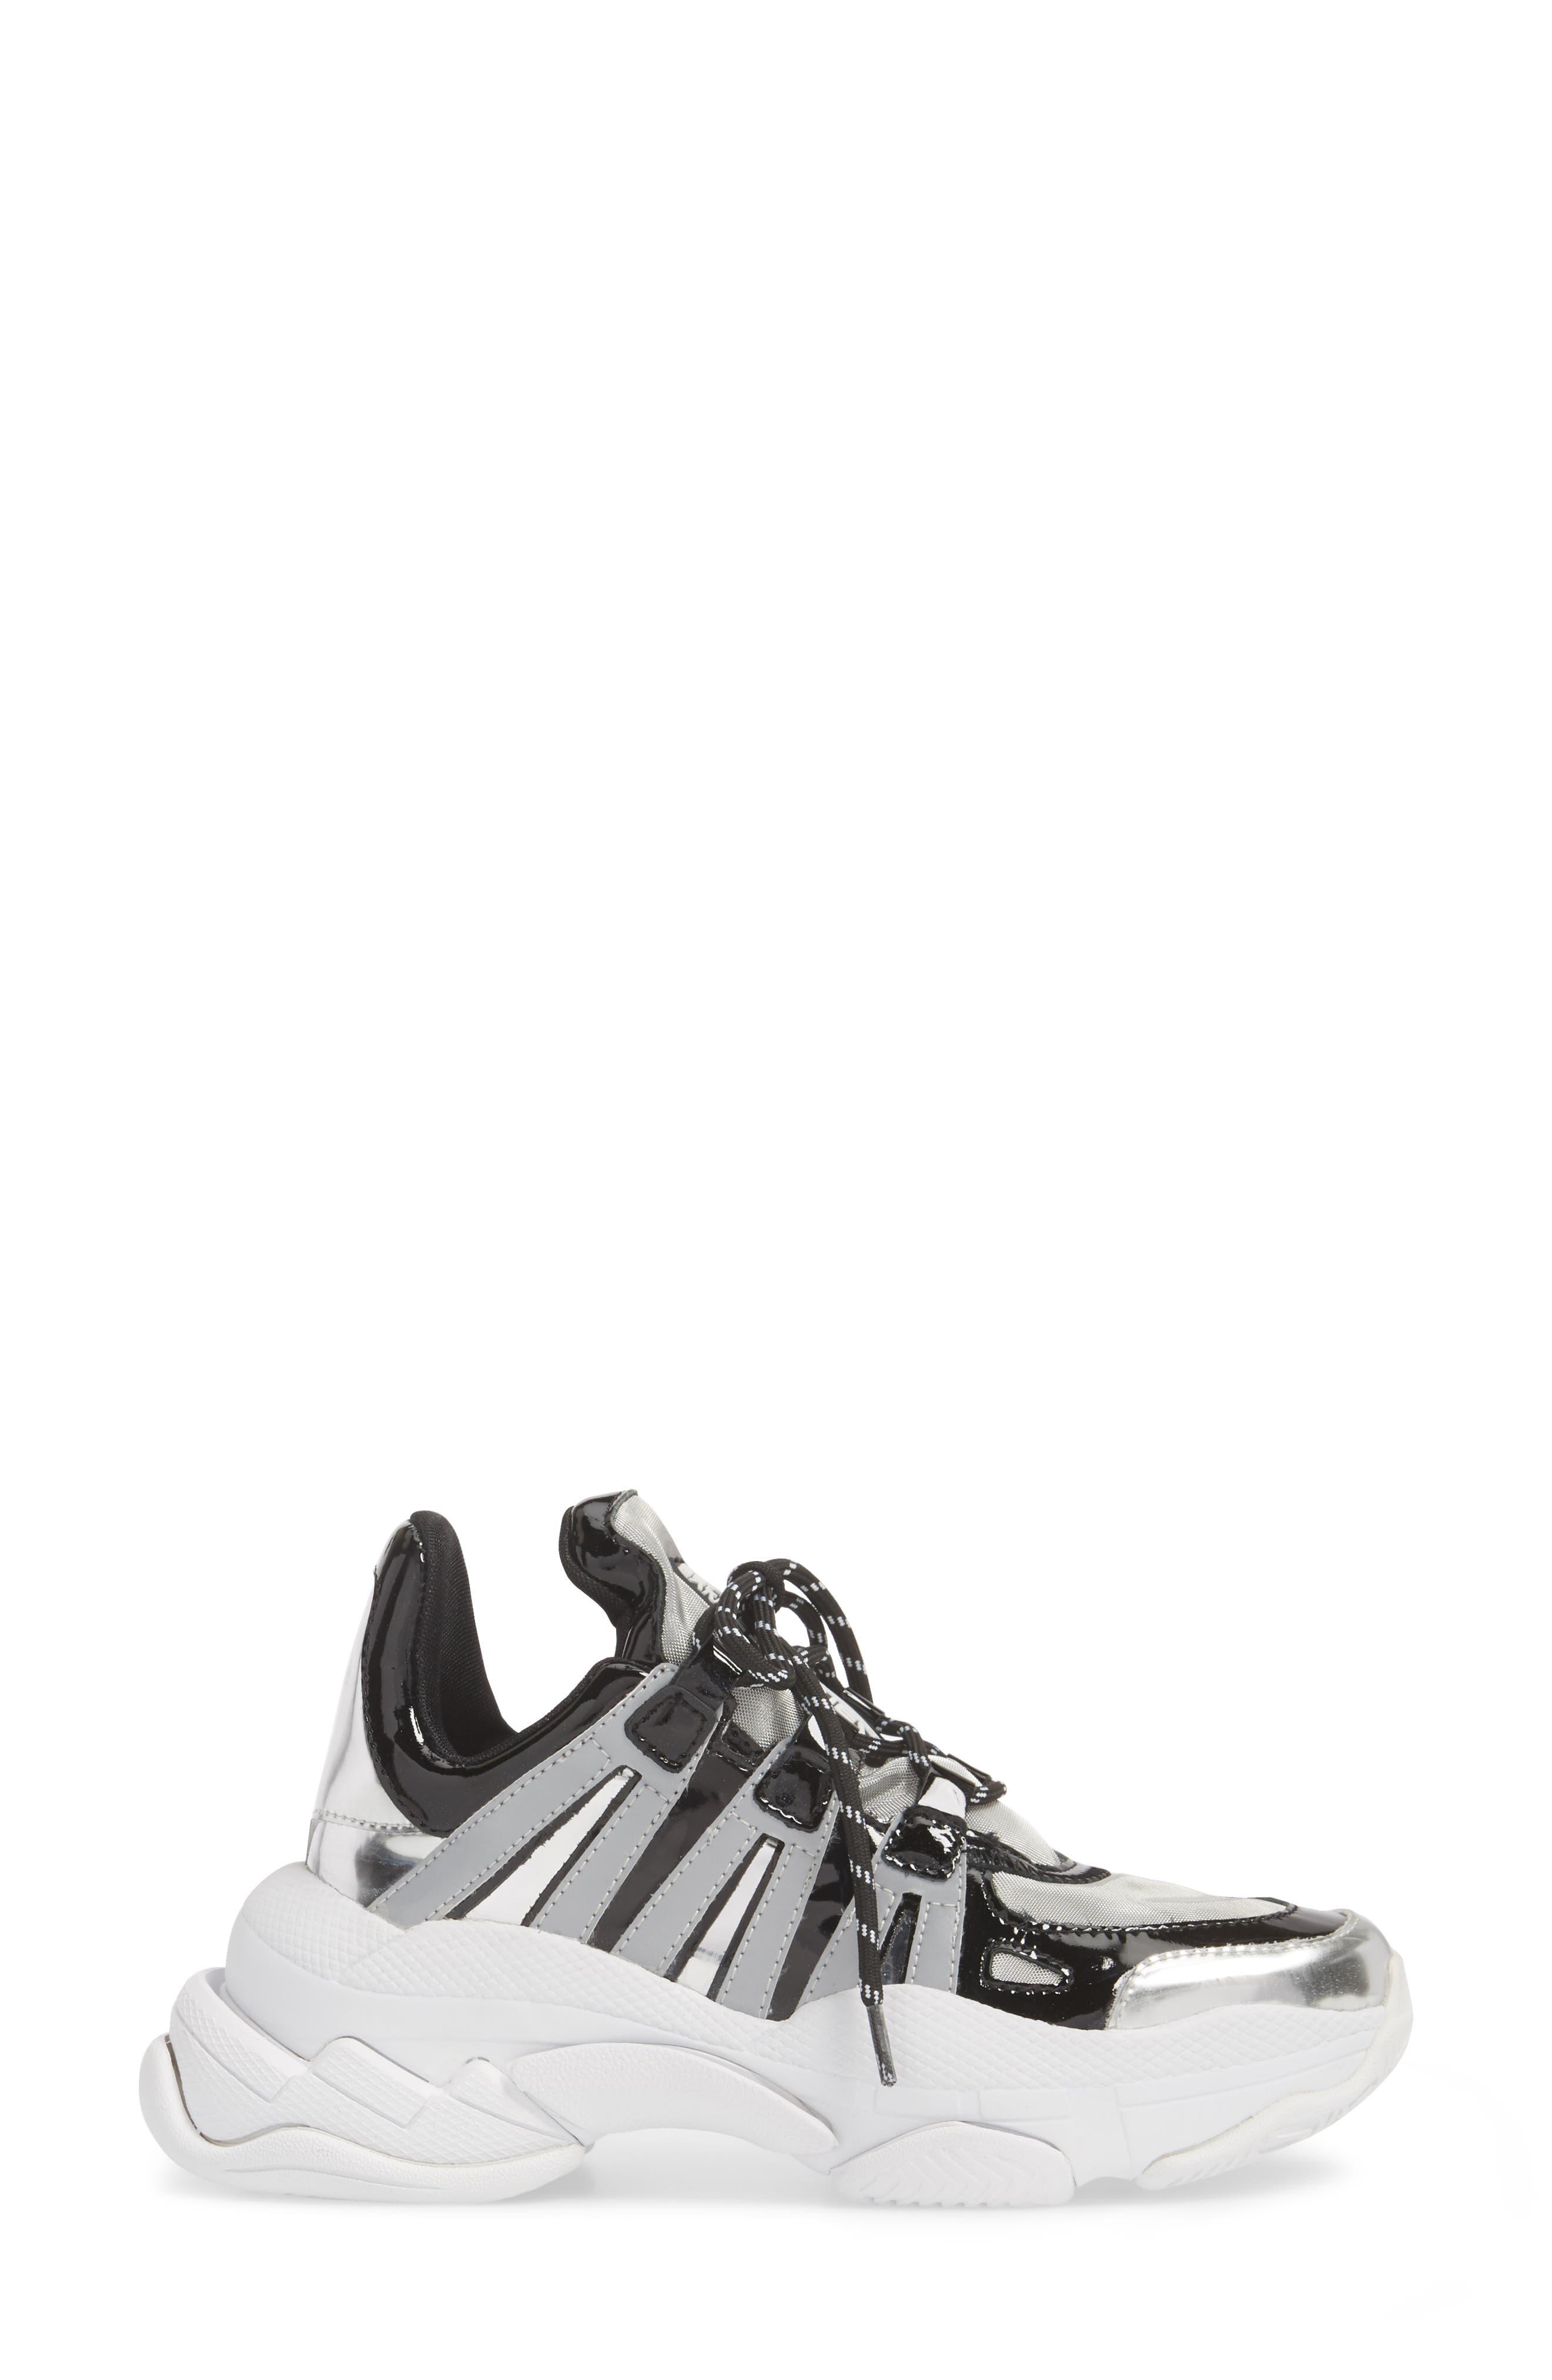 WiFi Sneaker,                             Alternate thumbnail 3, color,                             048